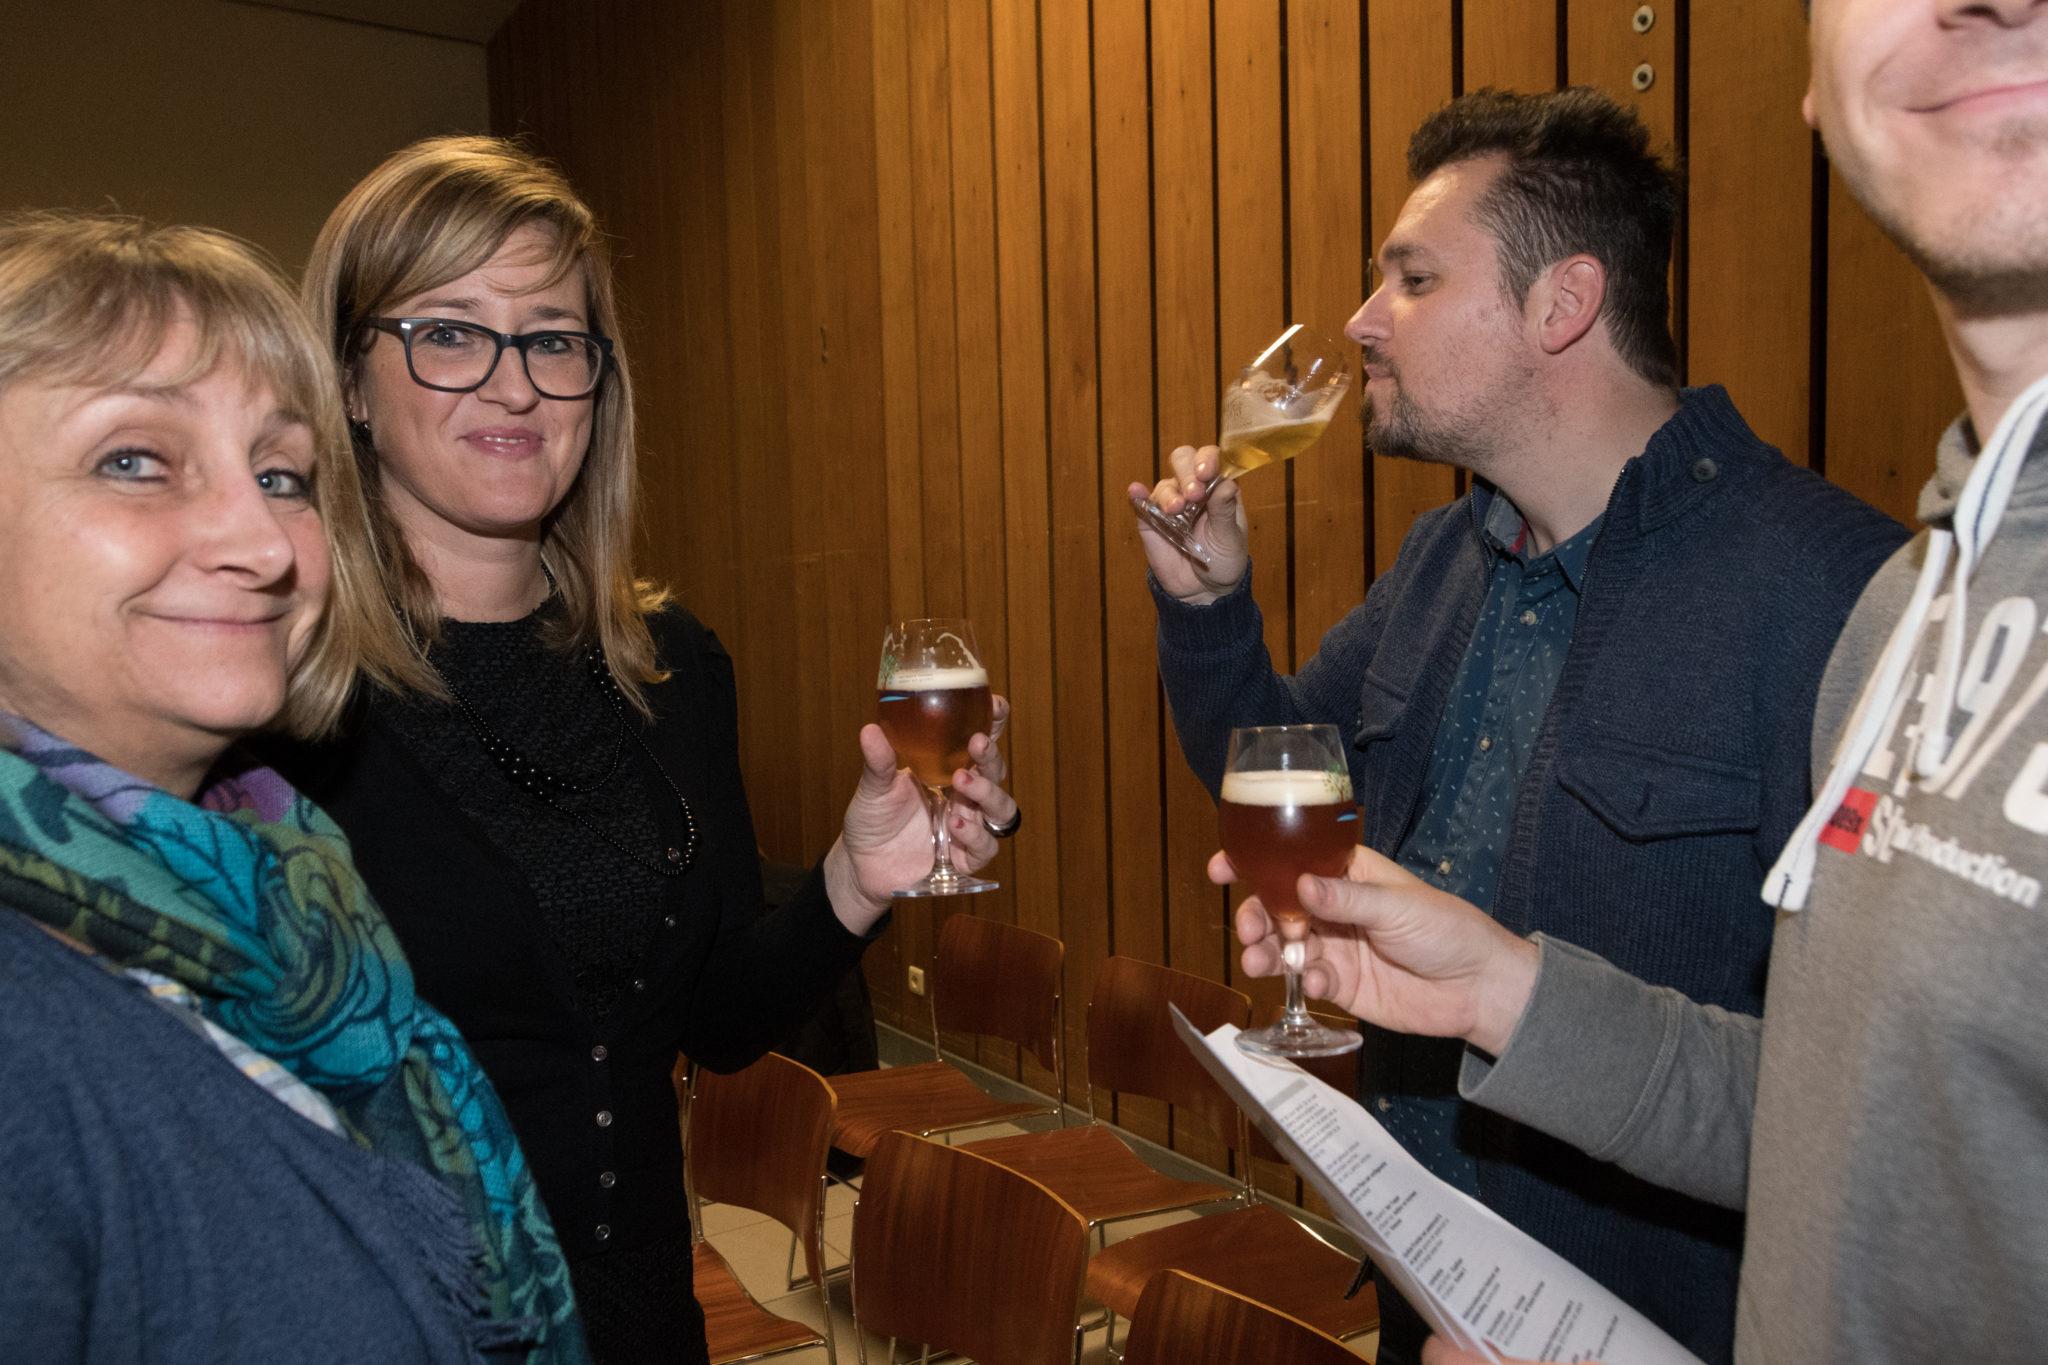 Toerisme-Rupelstreek-Bier-Chocolade8 Toerisme Rupelstreek Bier & Chocolade